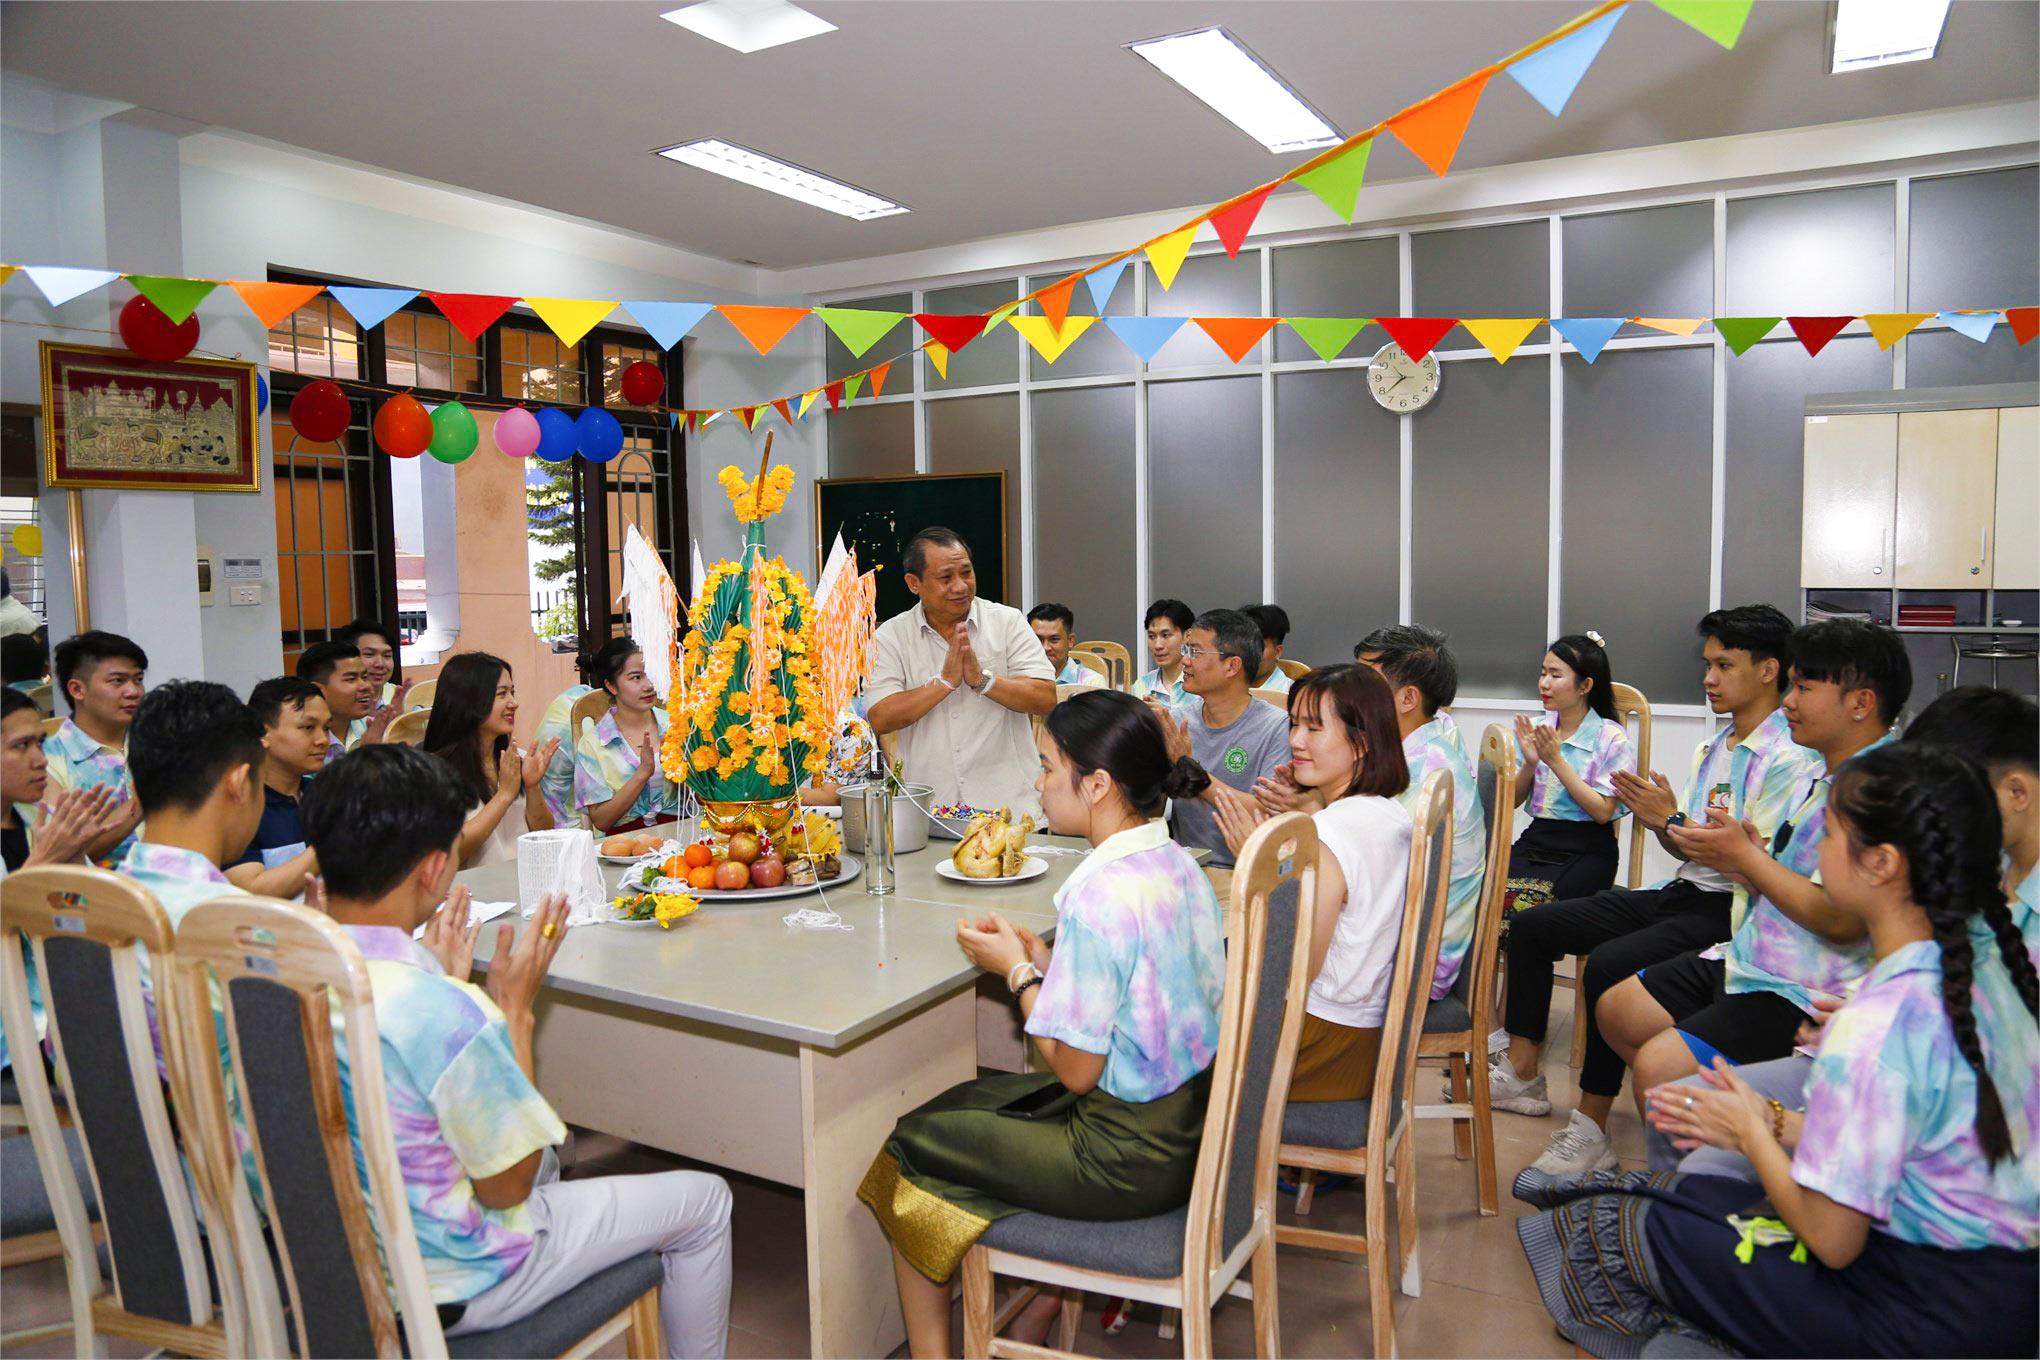 Traditional Bunpimay Festival organized for Lao students